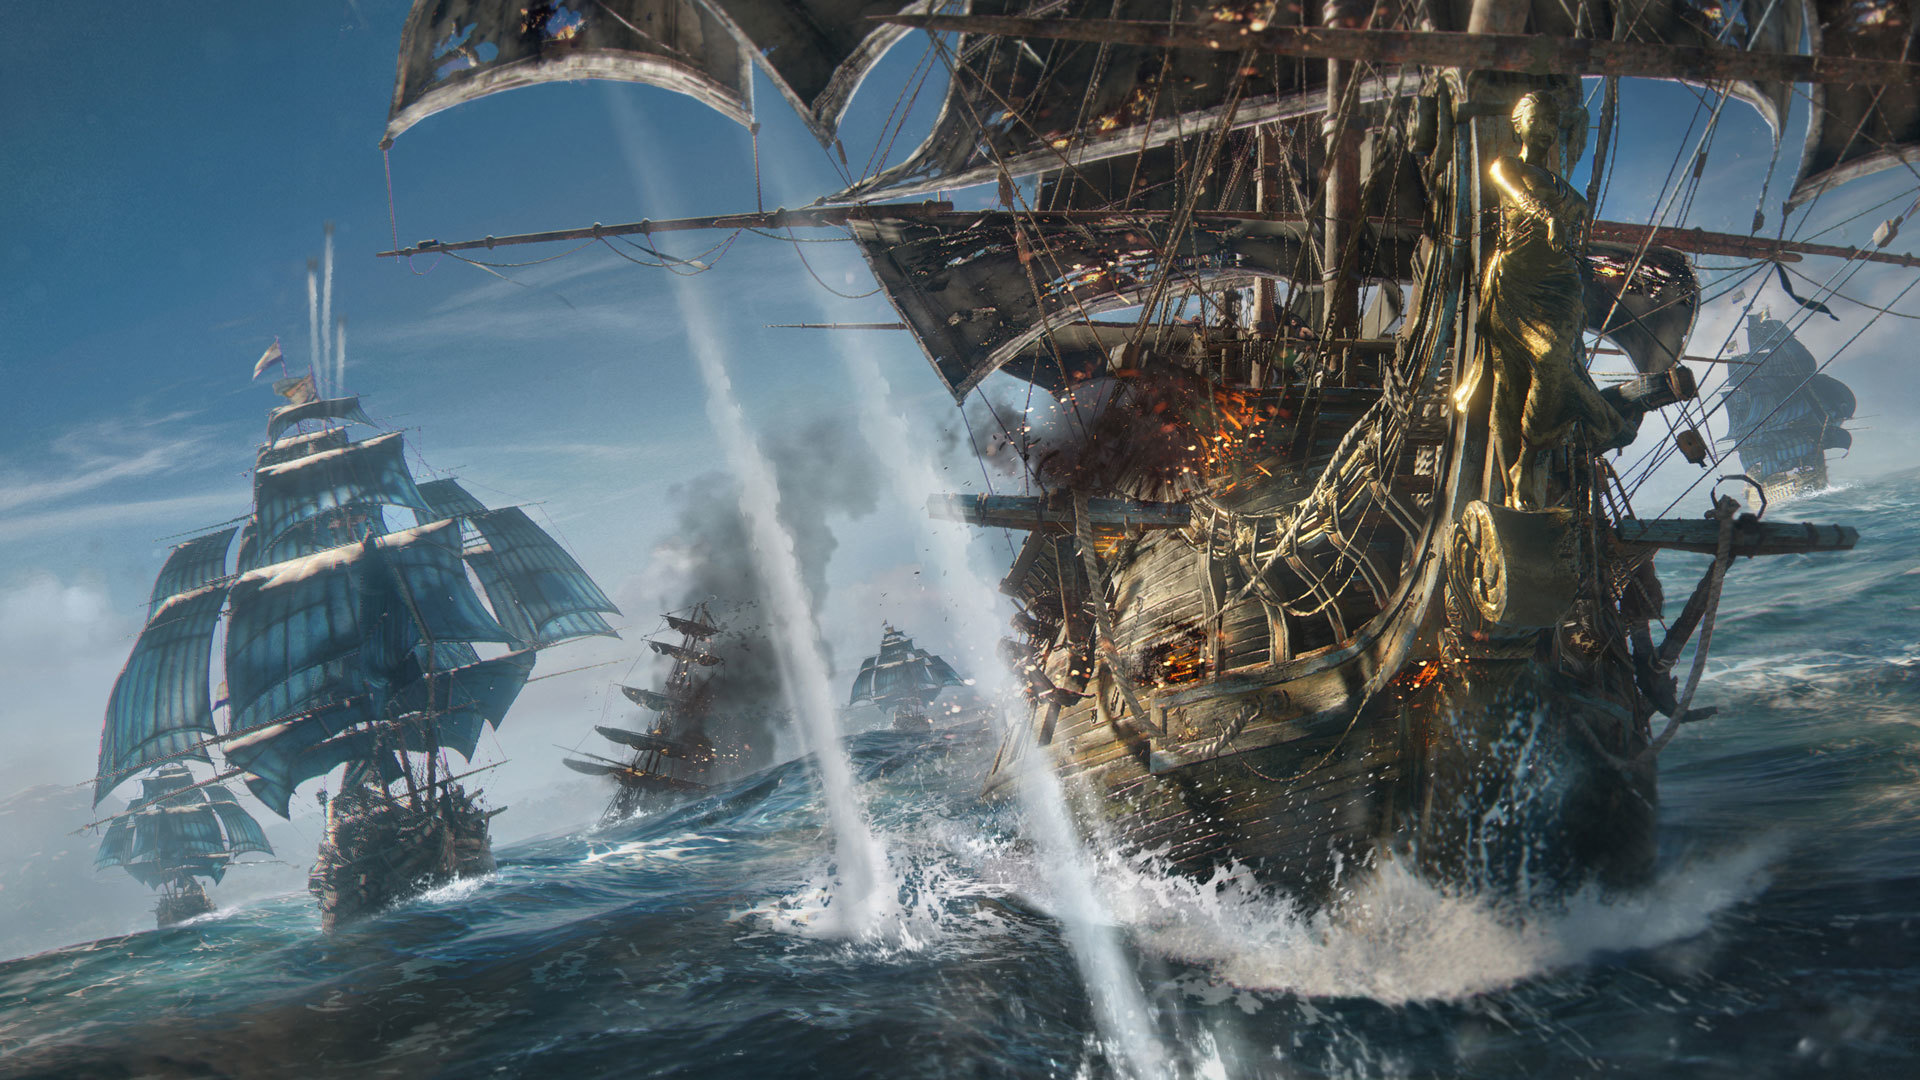 Ubisoft 新規ip Skull And Bones 発表 Wows海賊版 海賊船同士